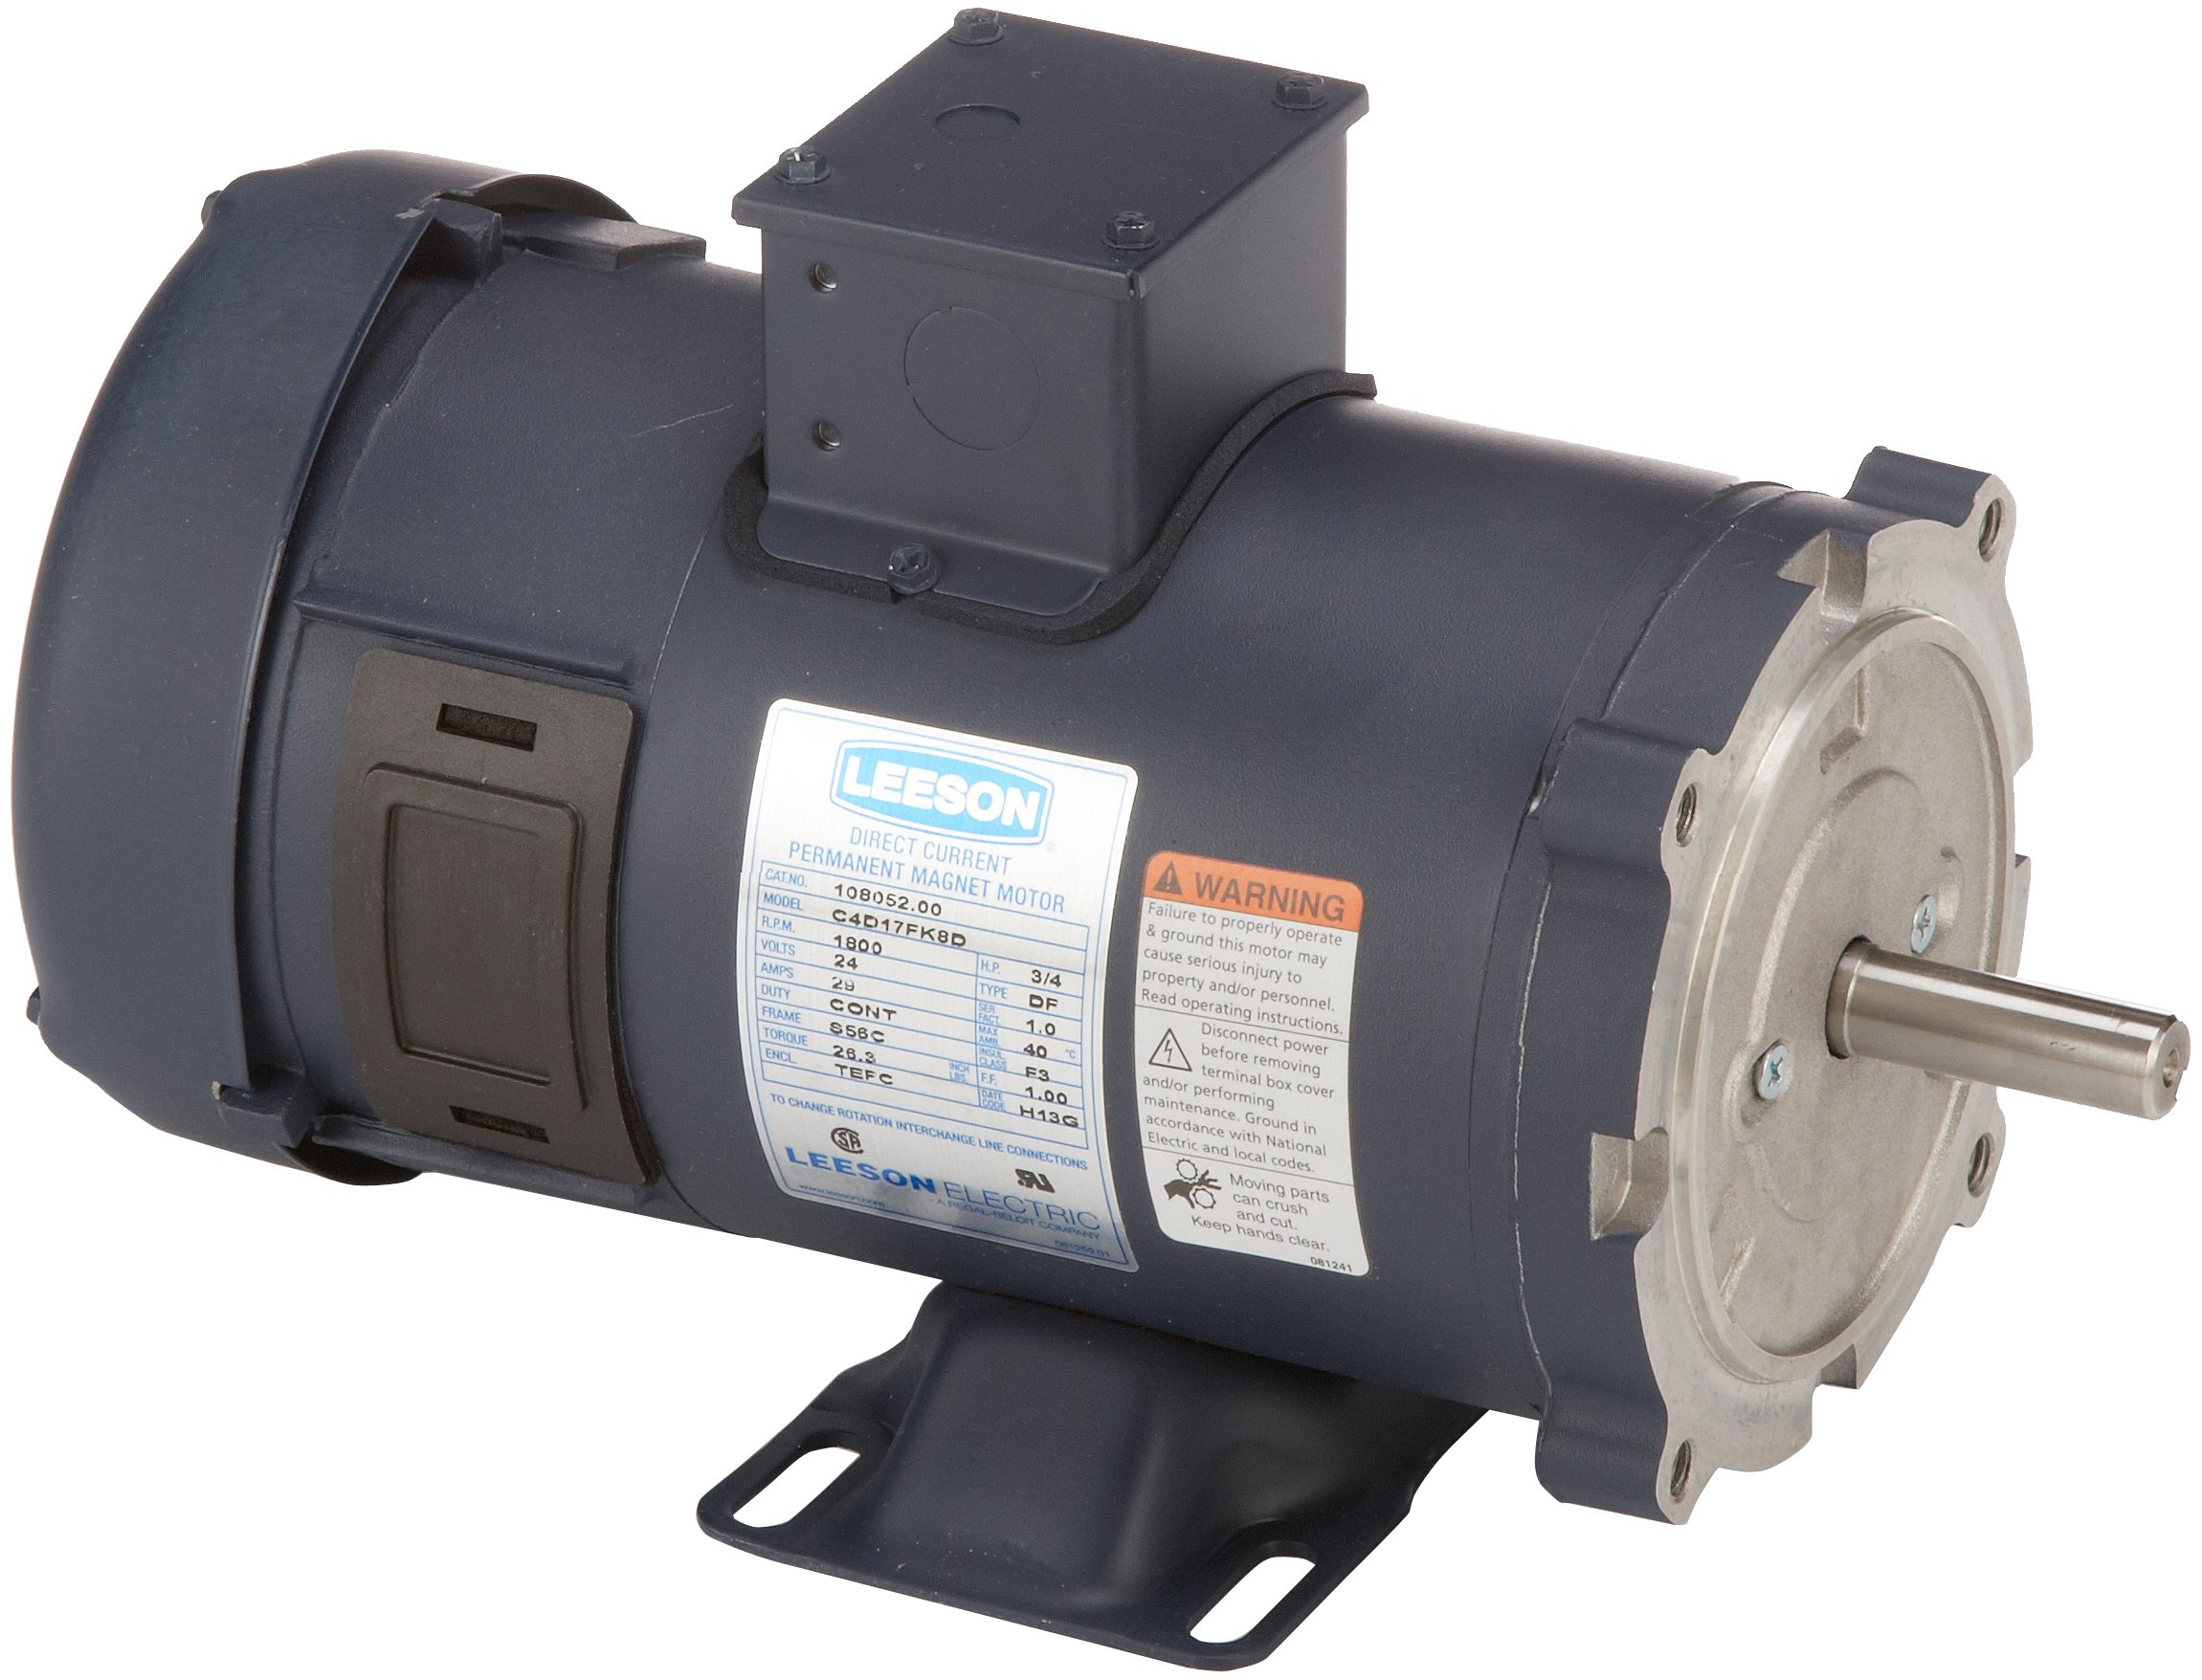 Leeson 108052.00 Low Voltage DC Motor, 56C Frame, C-Face Rigid Mounting, 3/4HP, 1800 RPM, 24V Voltage